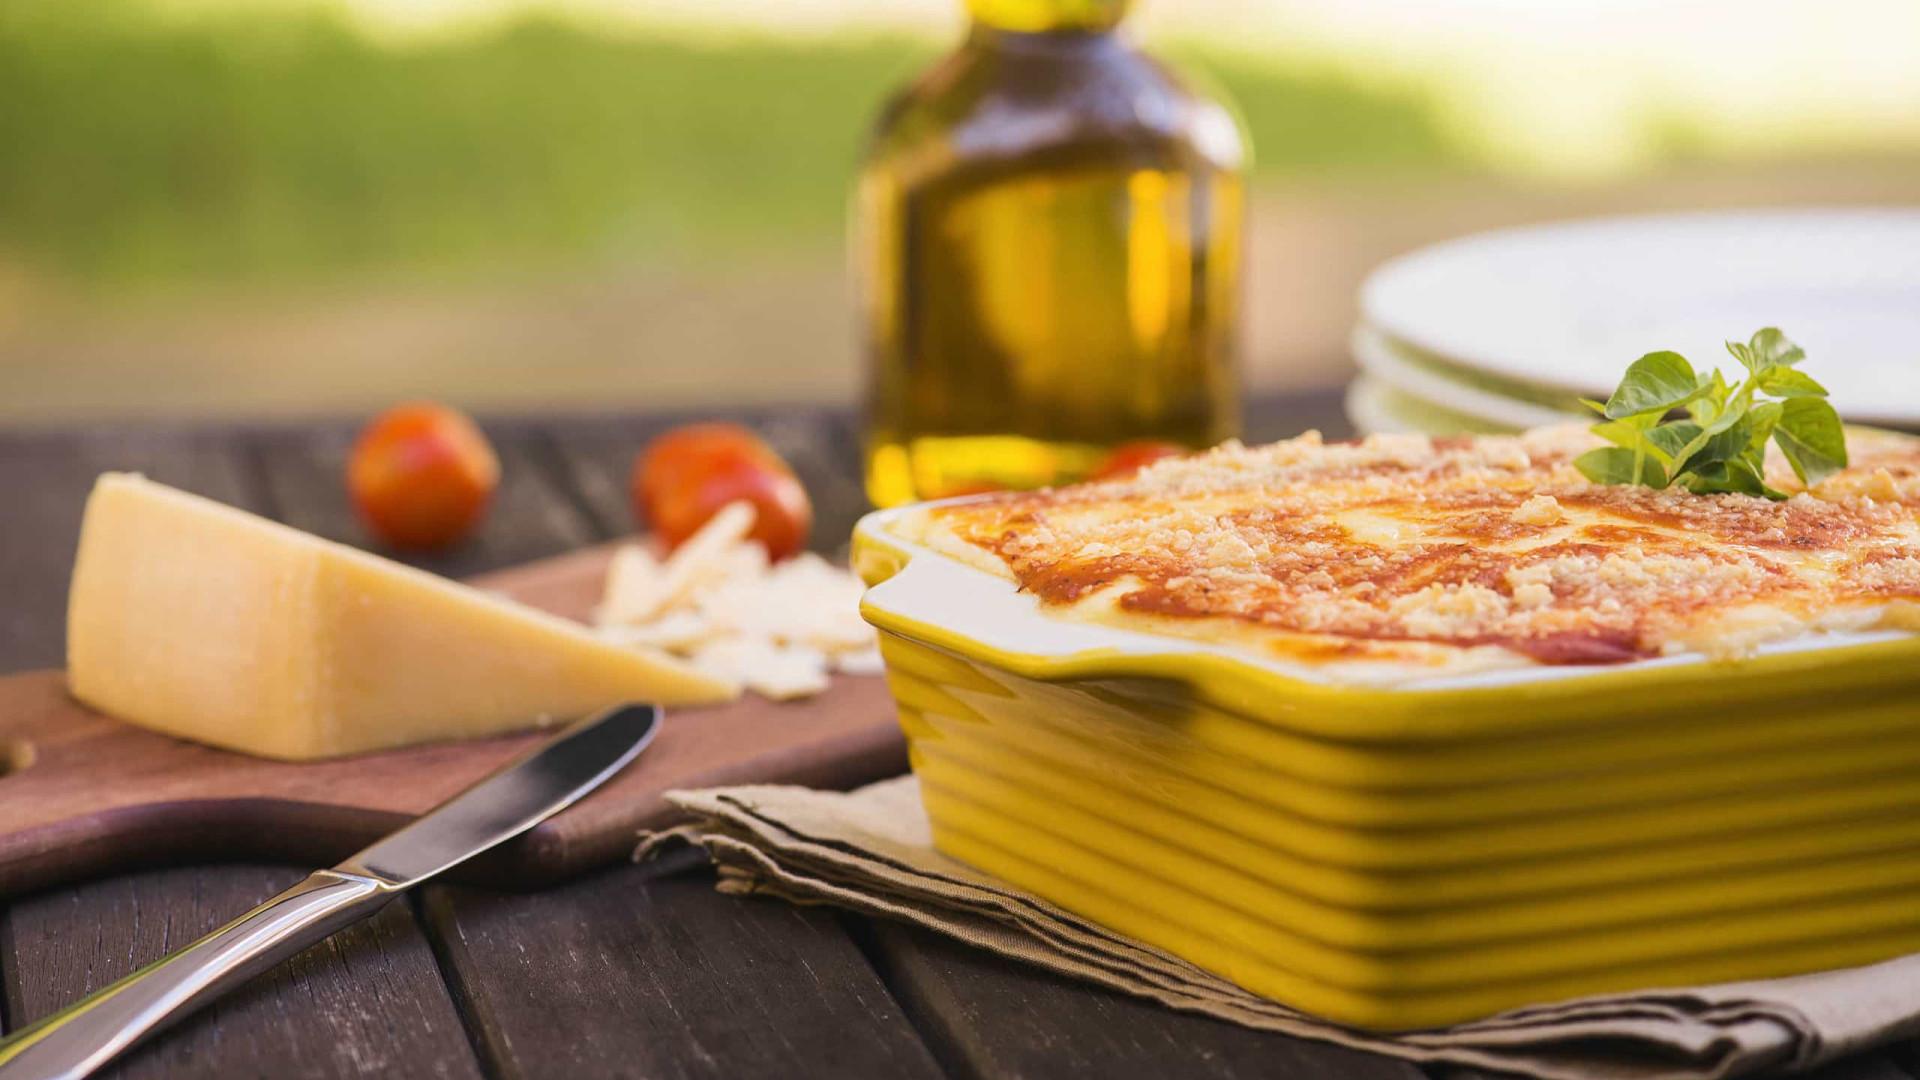 Receita: Lasanha de Frango com Queijo Cremoso e Presunto